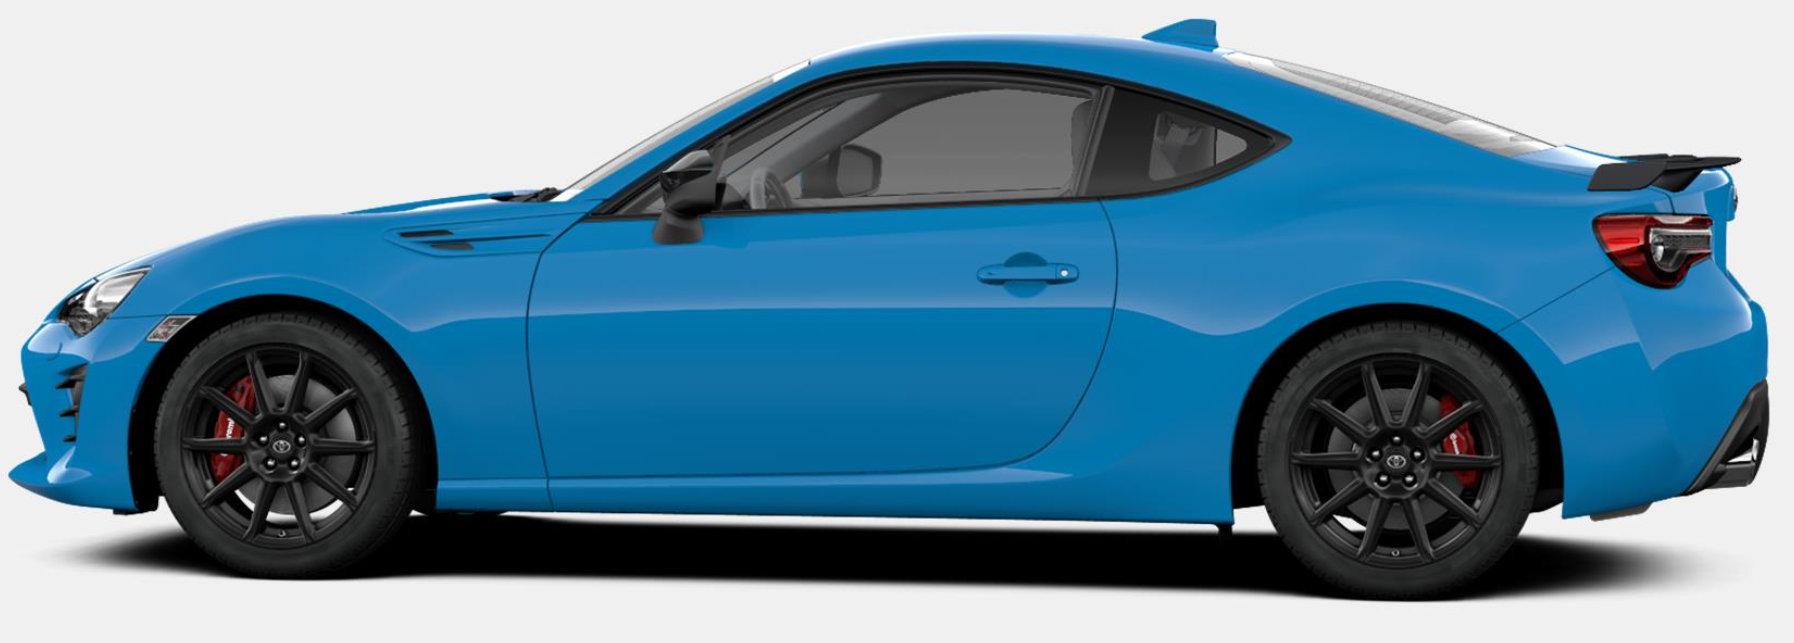 Toyota-GT86-leasen-2